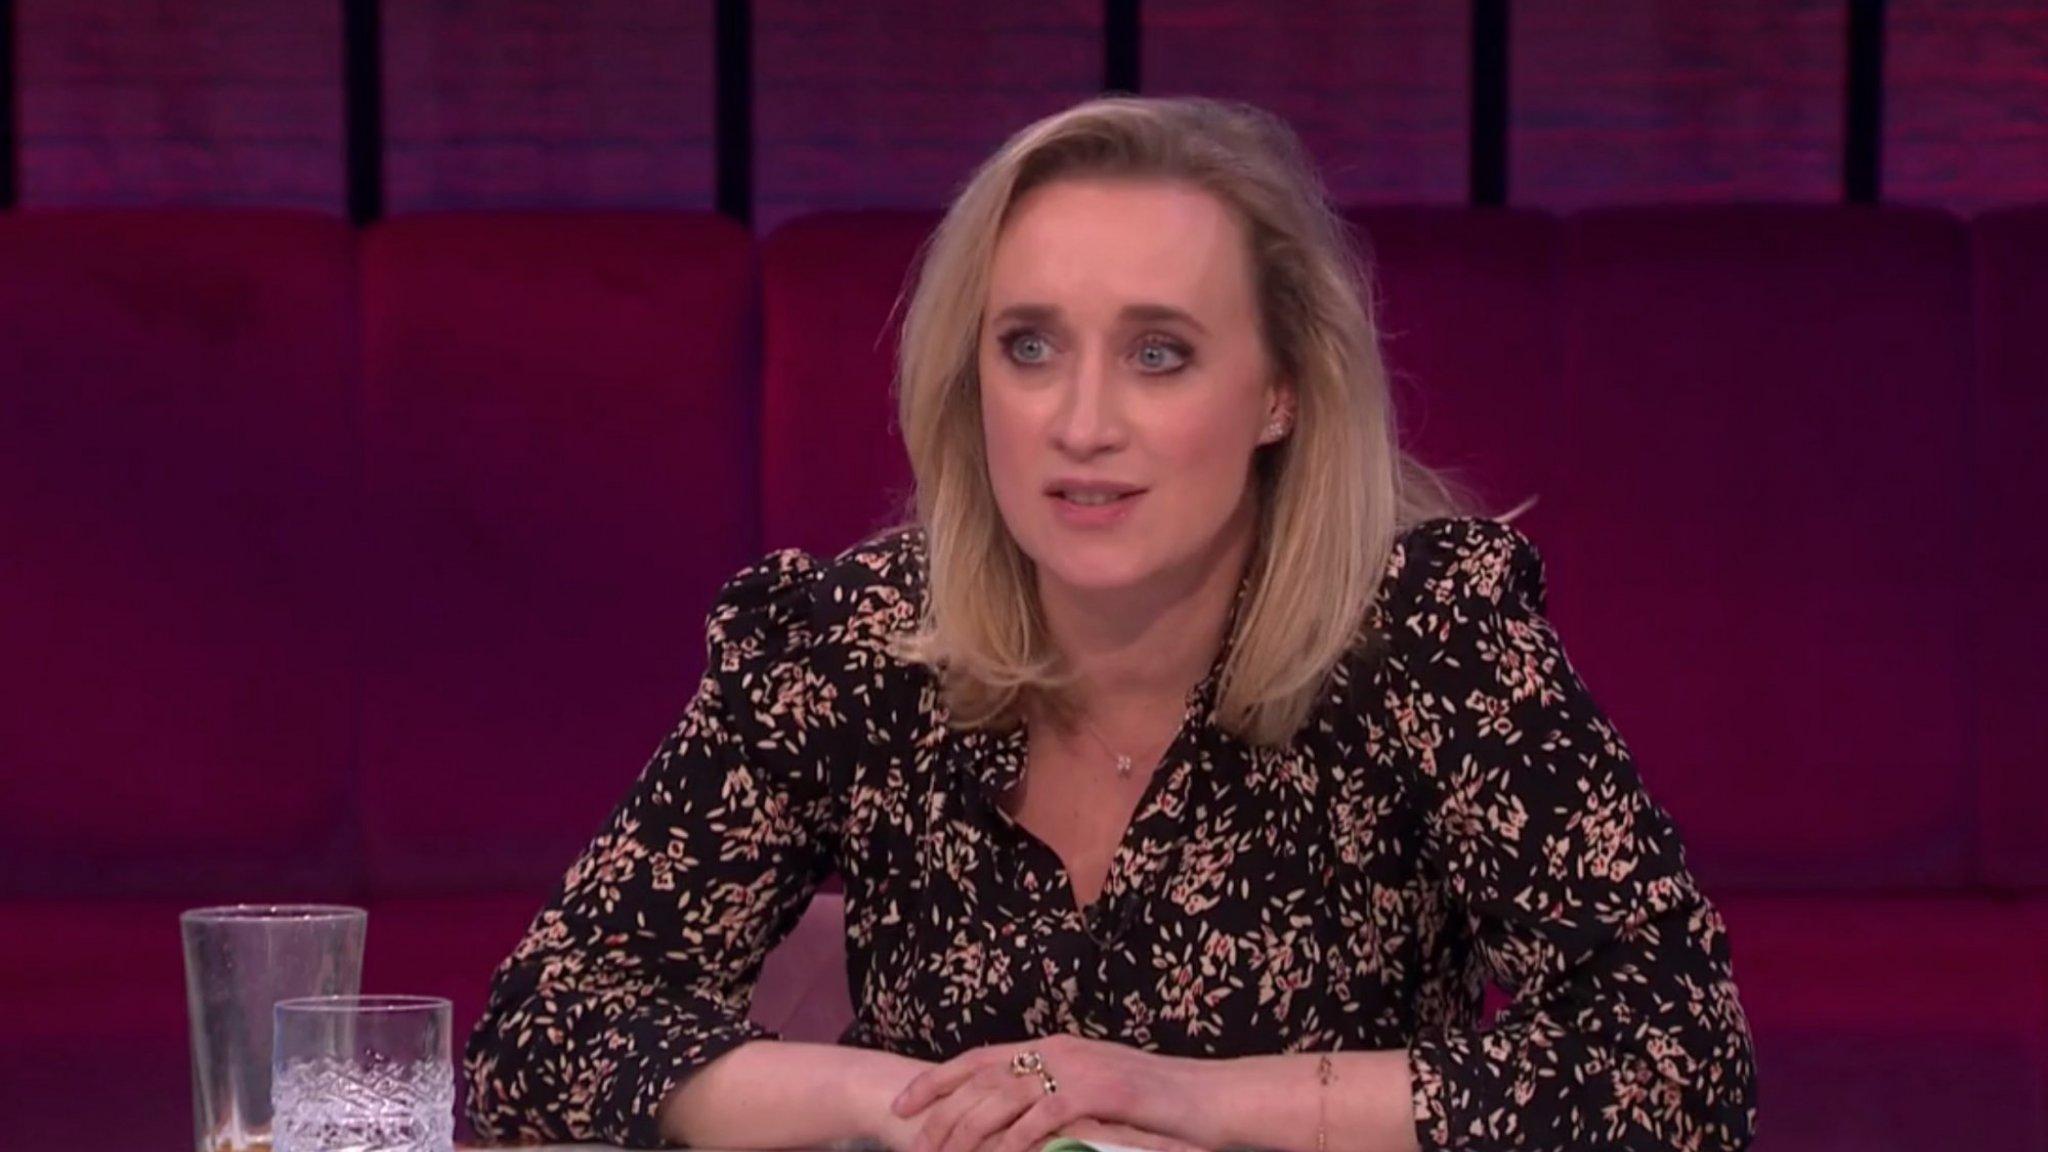 Geblunder in laatste minuten van Jinek verpest item: 'Tragiek!' - RTL Nieuws